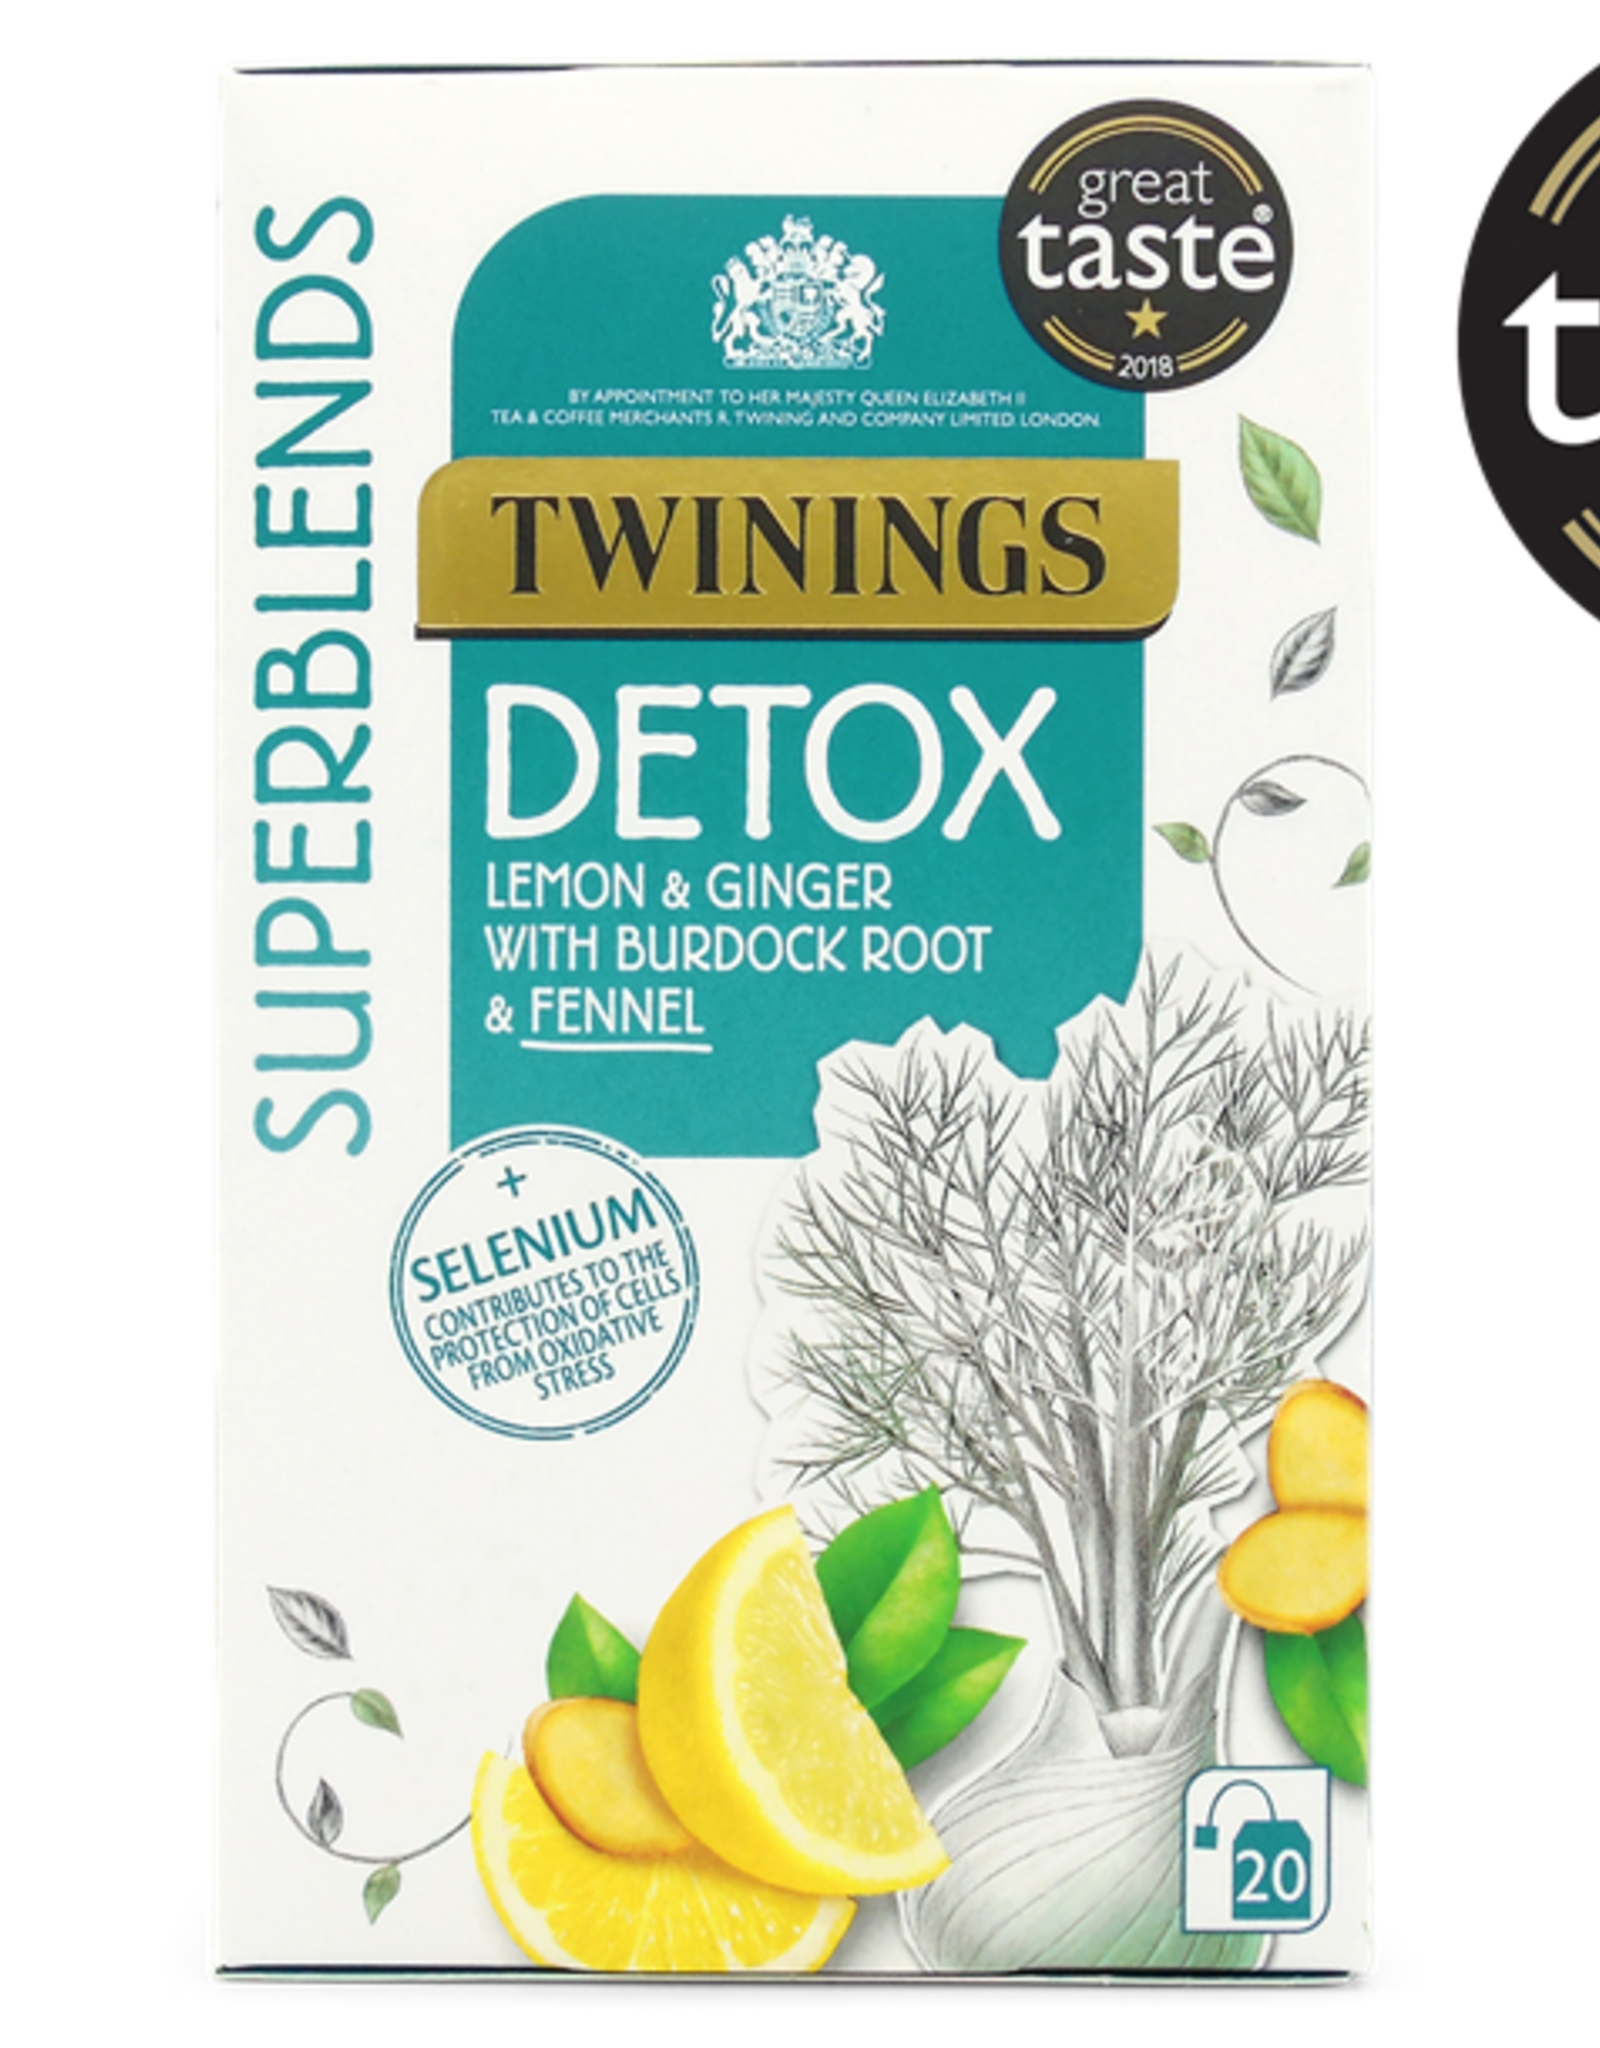 Twinings Twinings Detox Lemon & Ginger